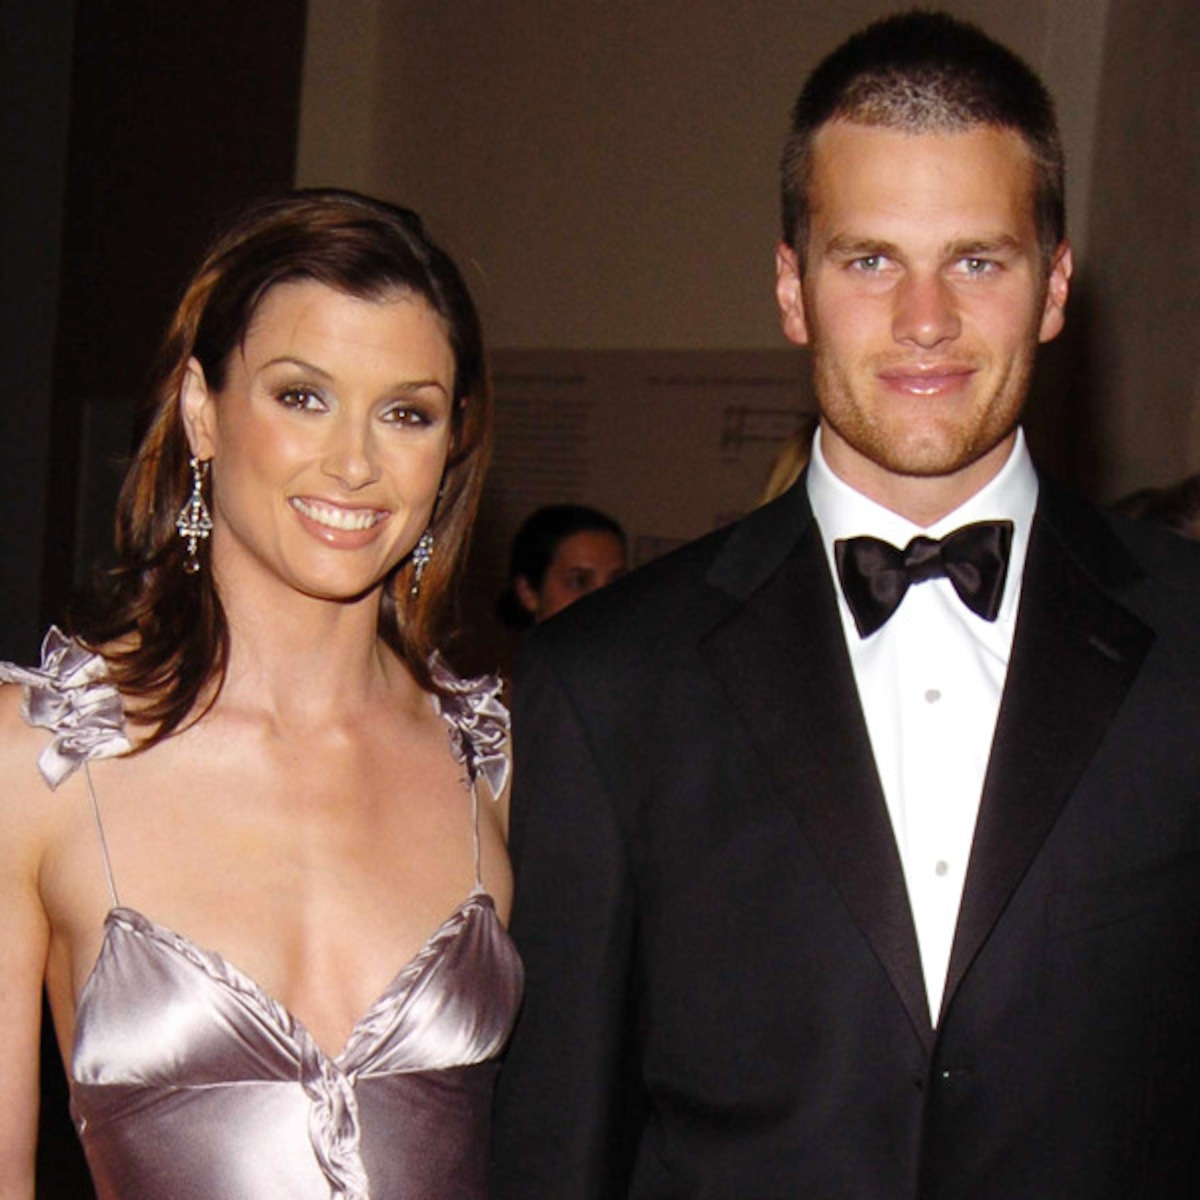 Tom Brady S Ex Bridget Moynahan Congratulates Him On Super Bowl Win E Online